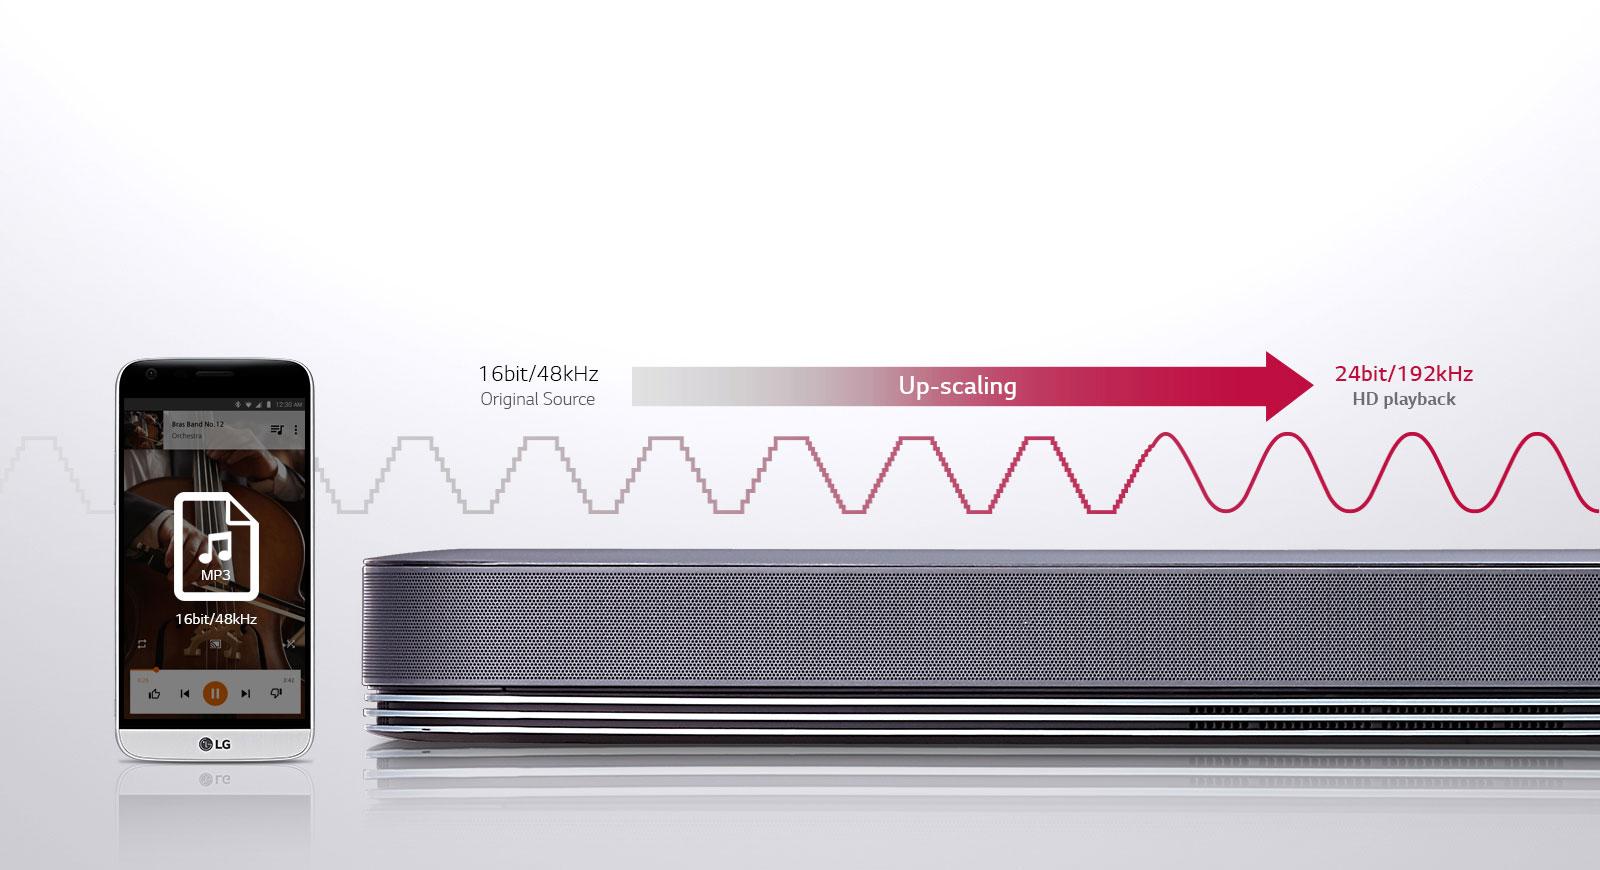 03_SJ9_High-Resolution-Audio-Upconverting-d